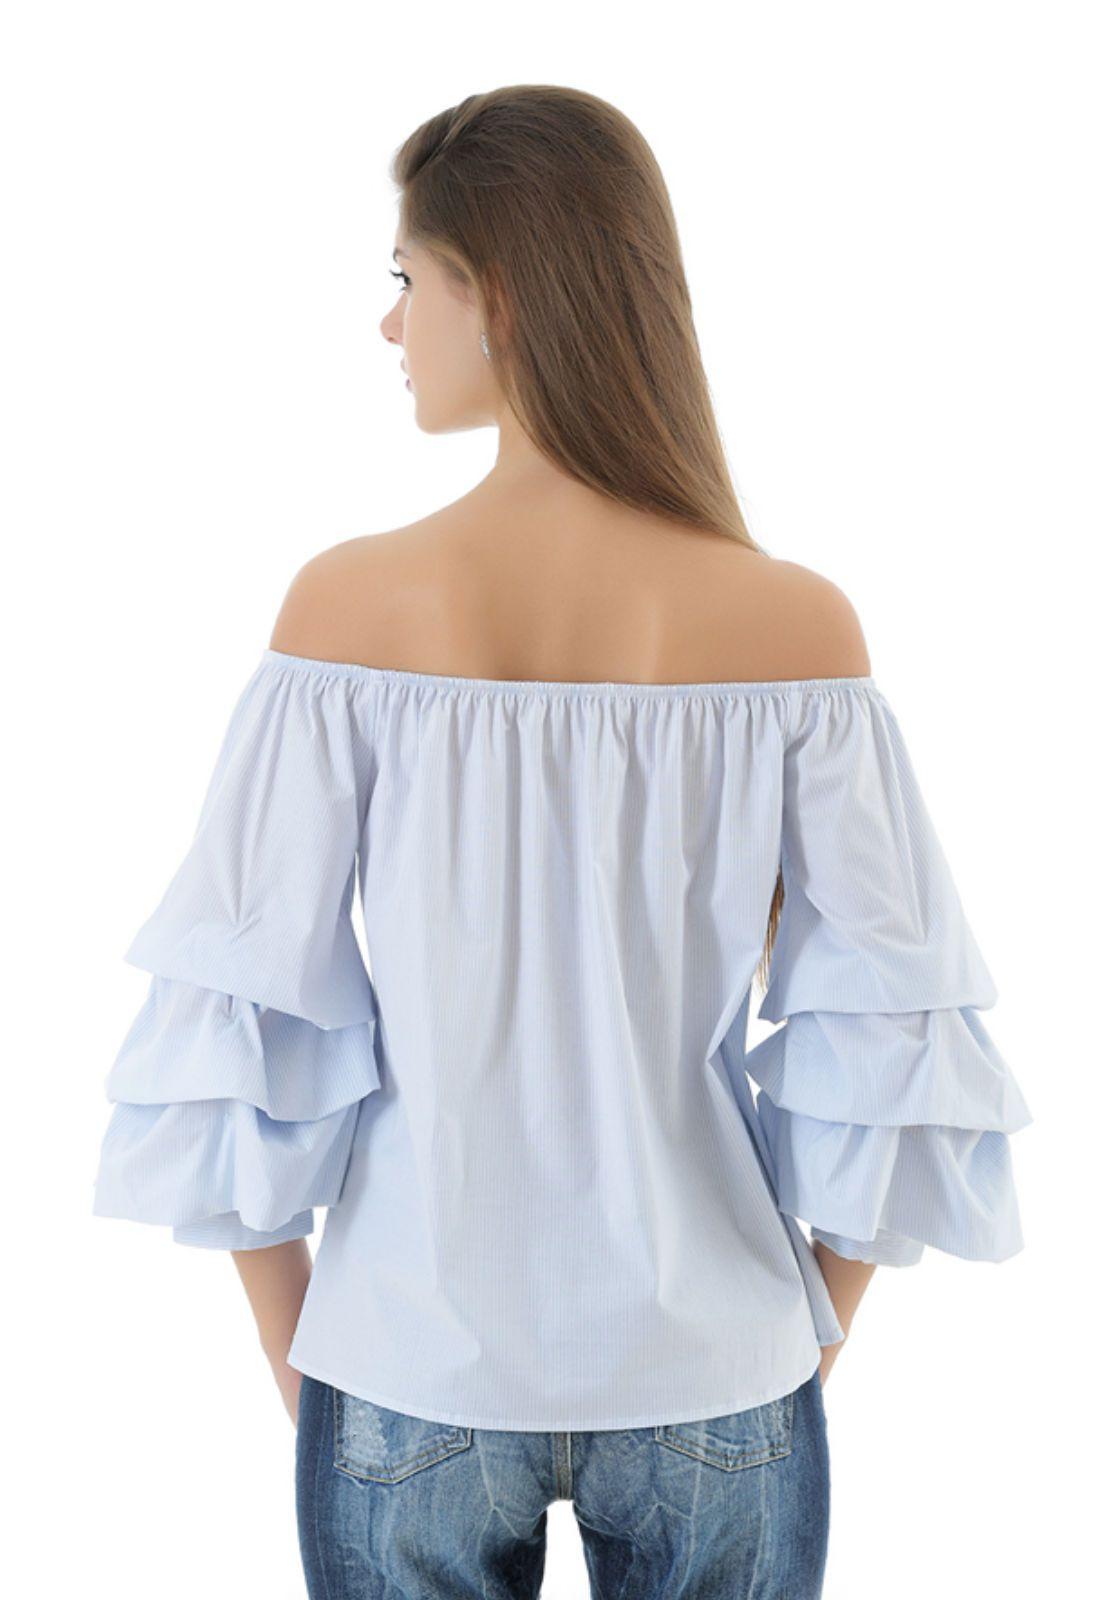 Blusa ombro a ombro manga longa